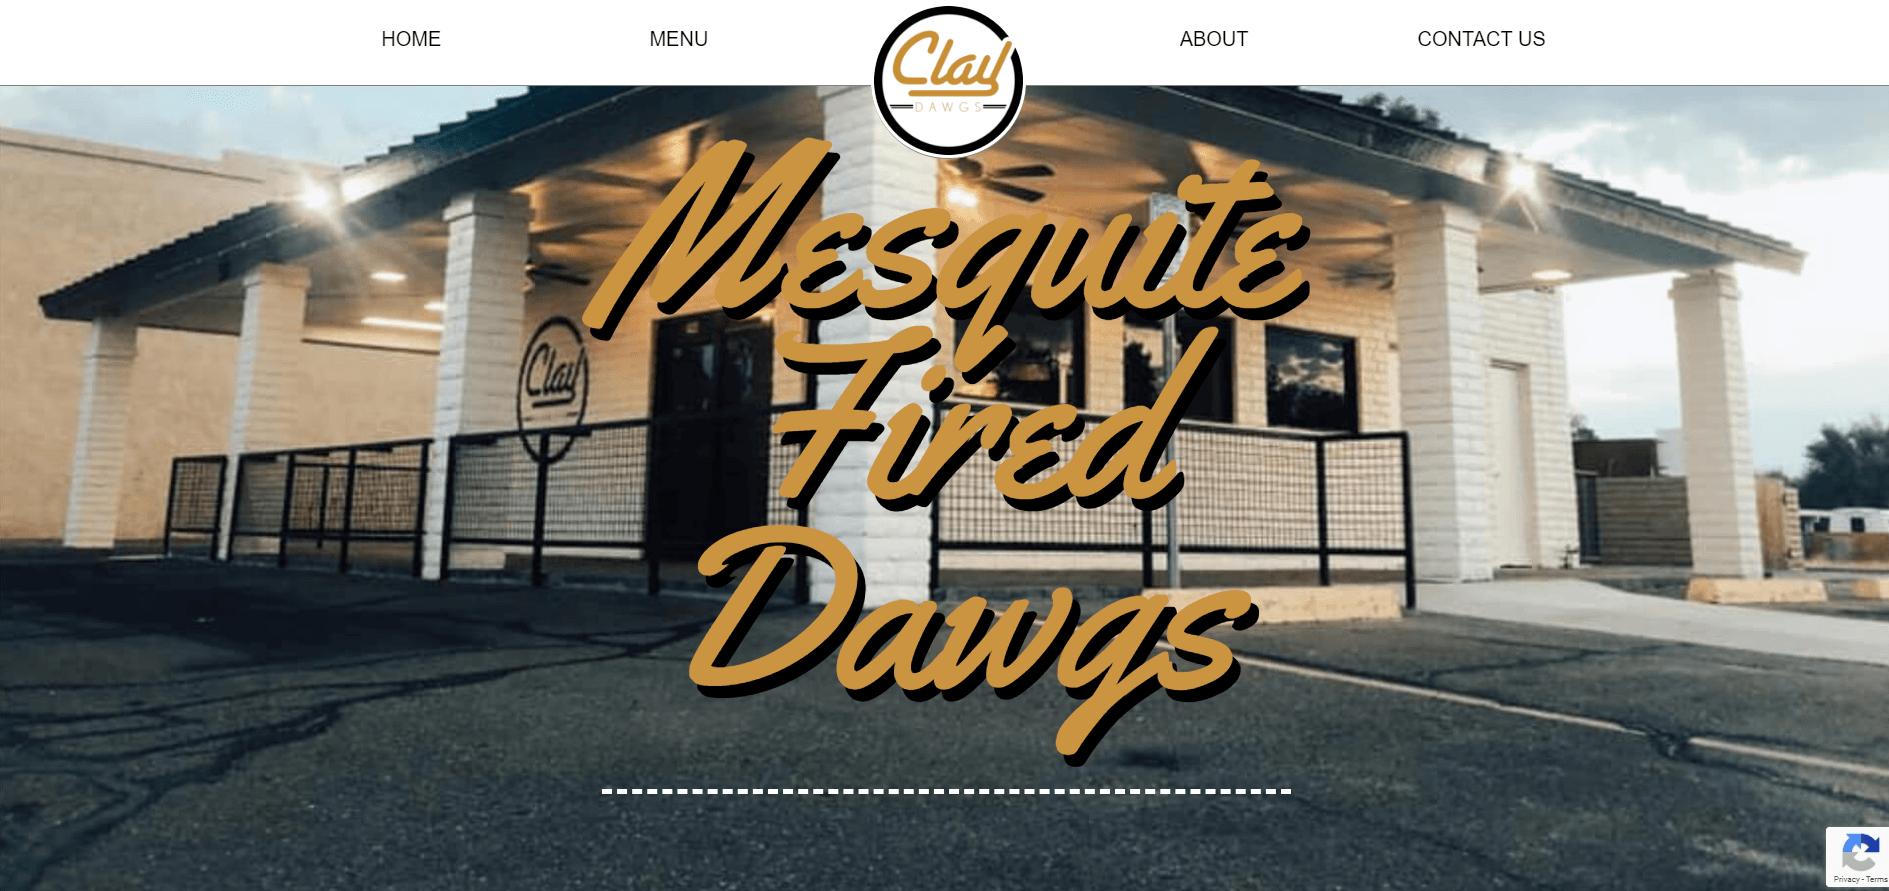 Phoenix Website Designers Launch Clay Dawgs